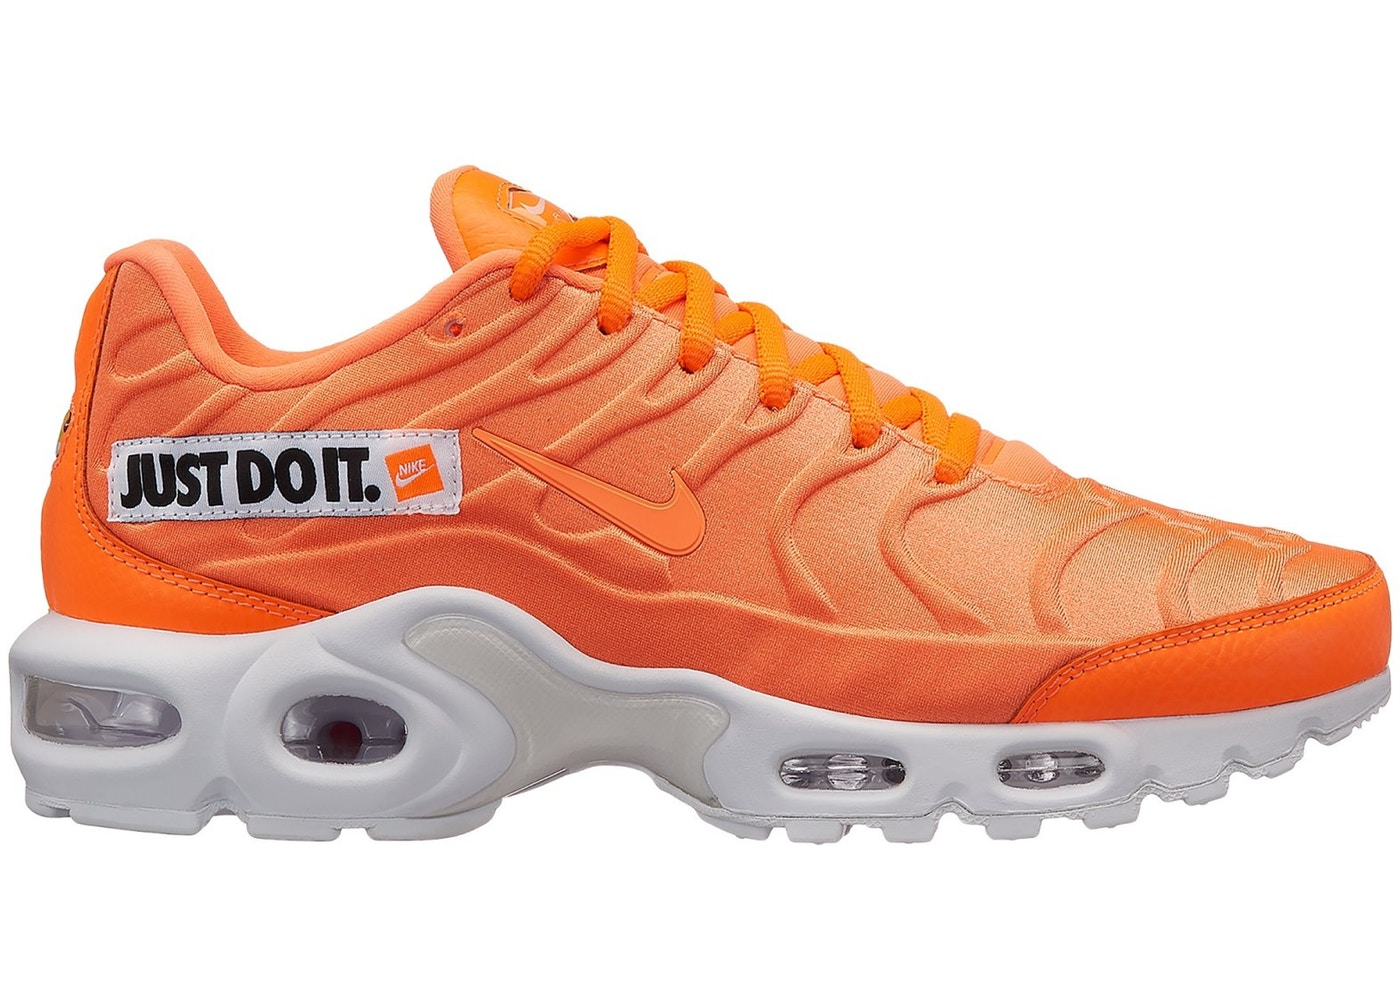 Nike Air Max Plus Just Do It Pack Orange (W) - 862201-800